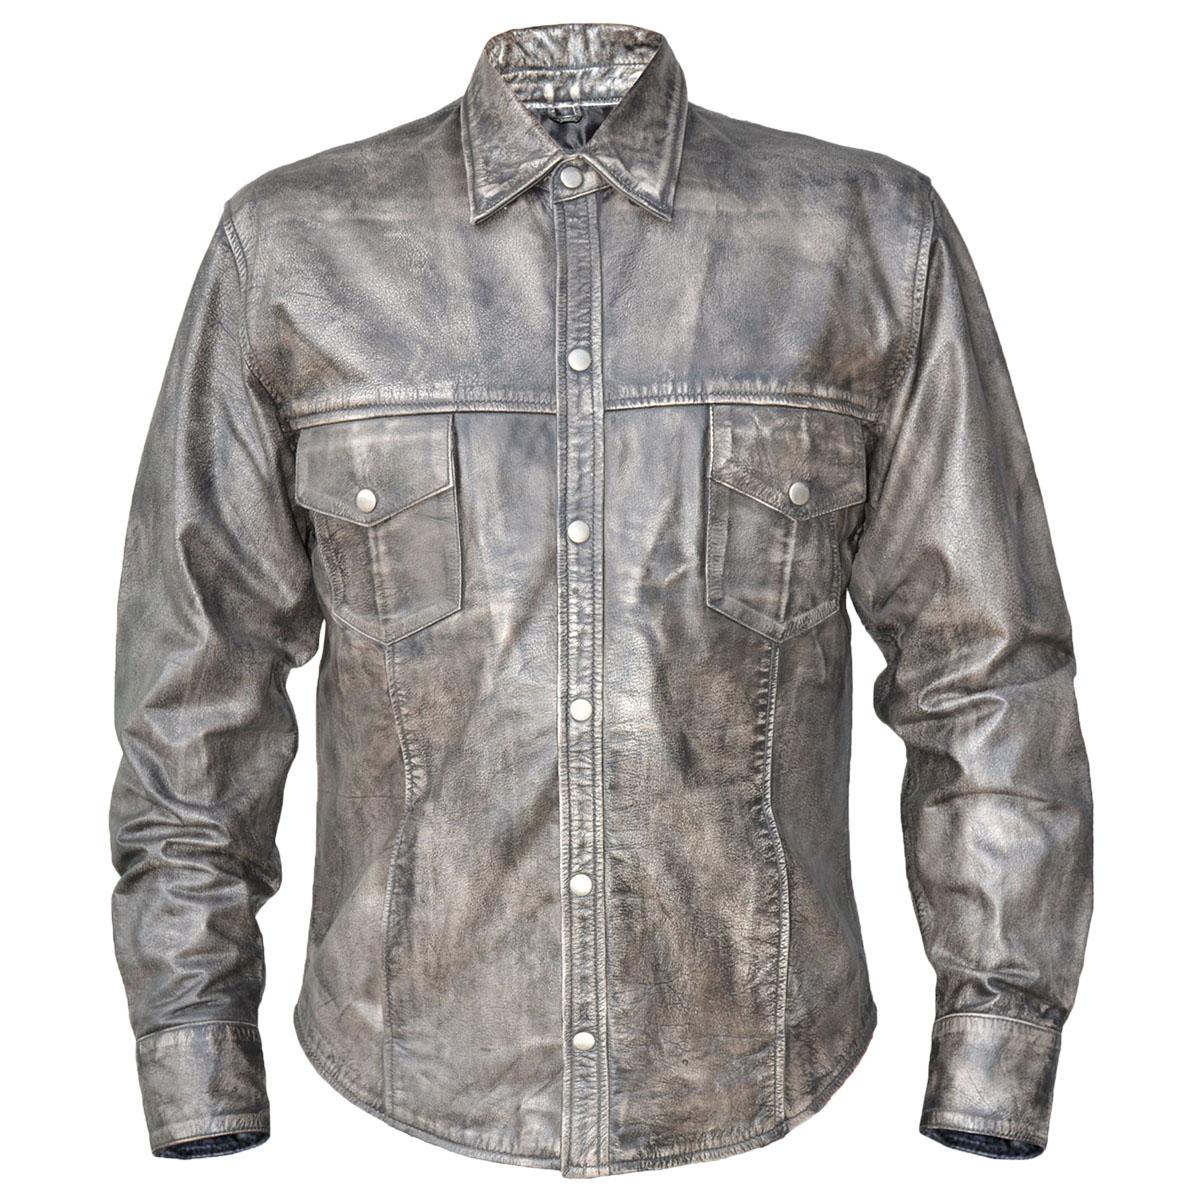 Xelement BXU85200 Urban Armor Comfort Mens Grey Leather Shirt with Gunmetal Sna